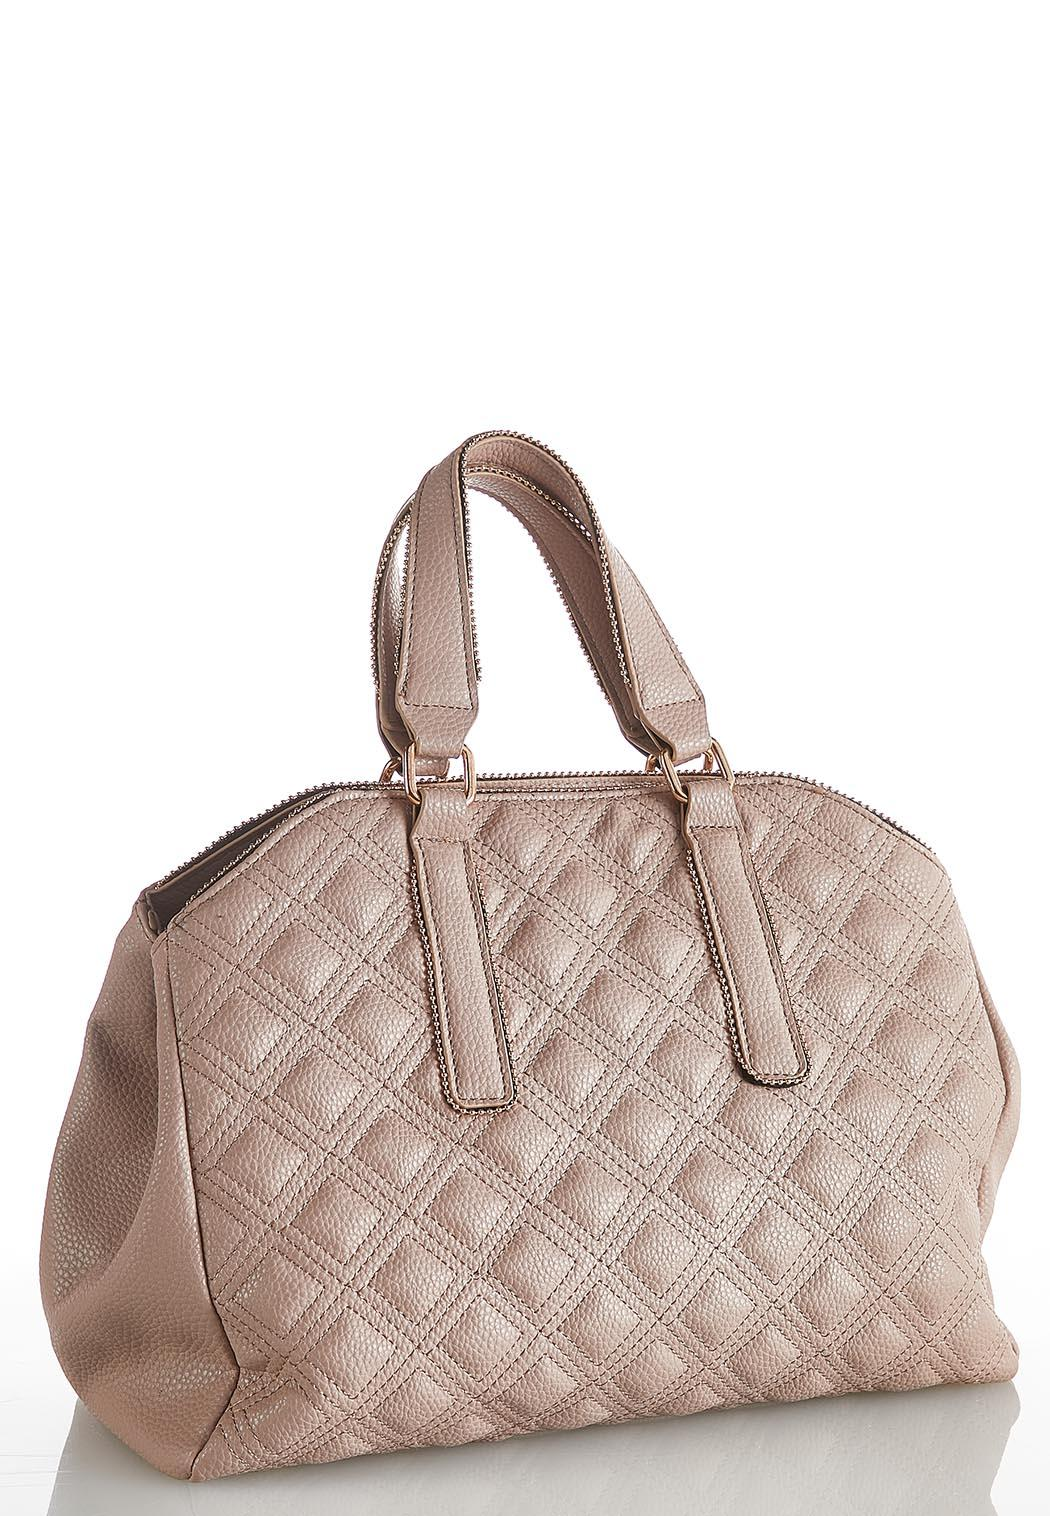 Stud Trim Quilted Hobo Handbag